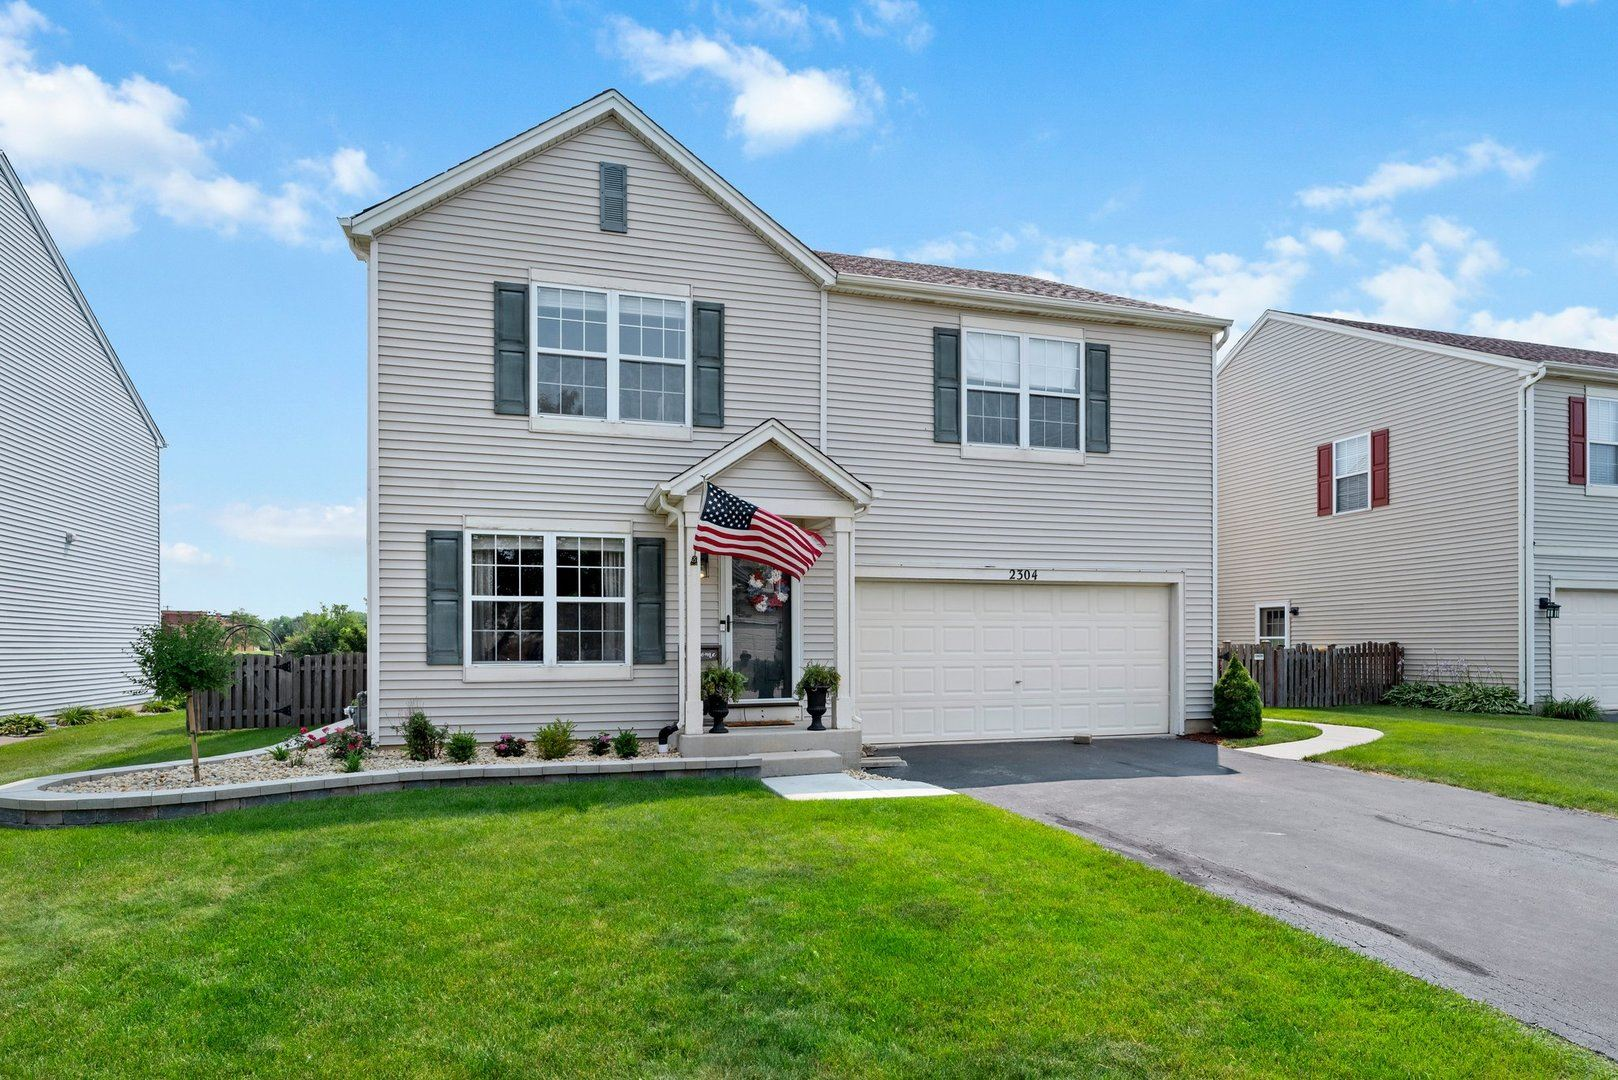 Photo of 2304 Country Ridge Drive, Plainfield, IL 60586 (MLS # 11164386)